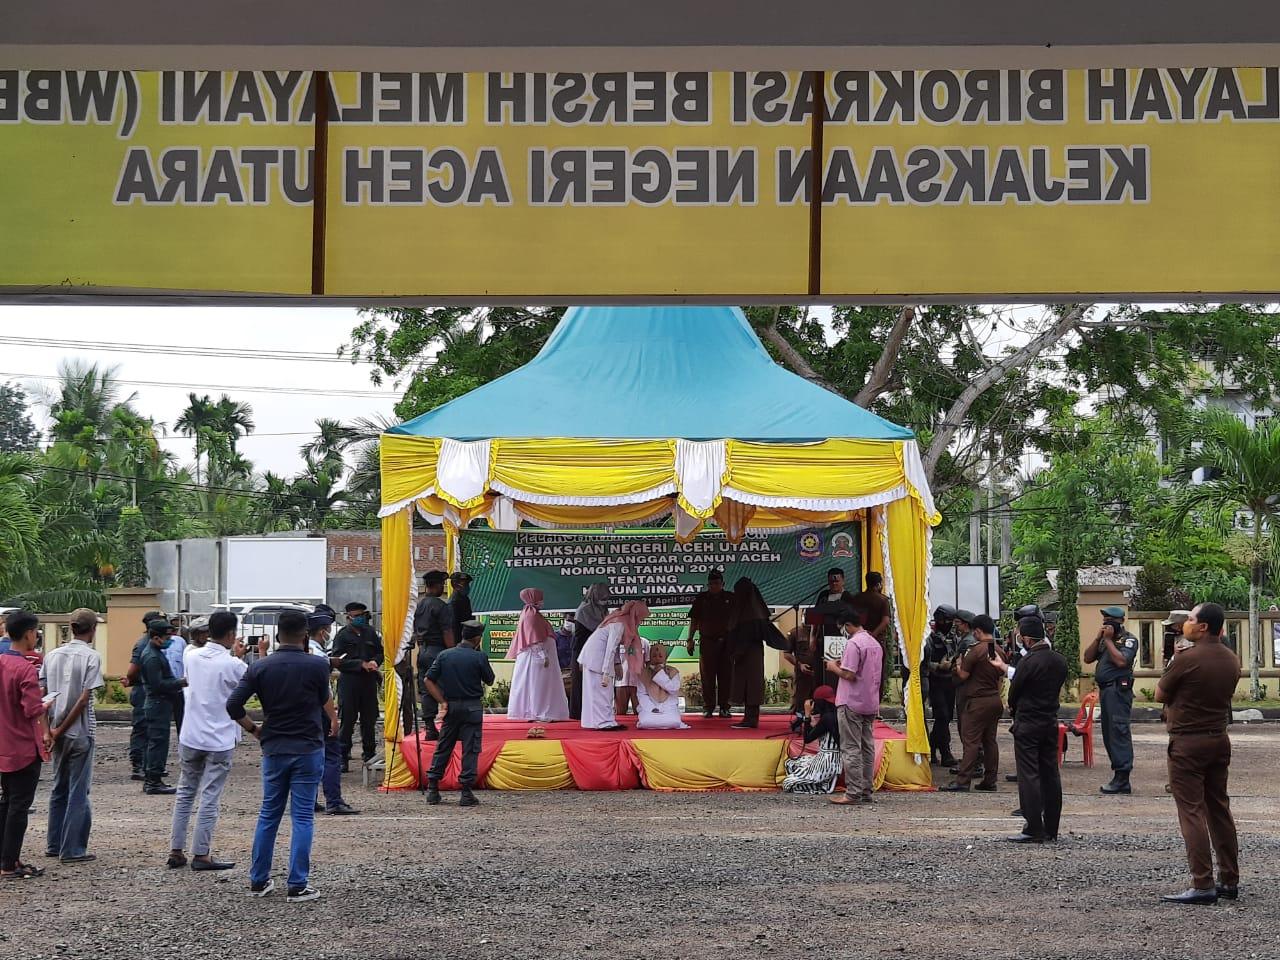 Empat Terpidana Pelanggar Qanun Jinayat di Aceh Utara Jalani Eksekusi Cambuk